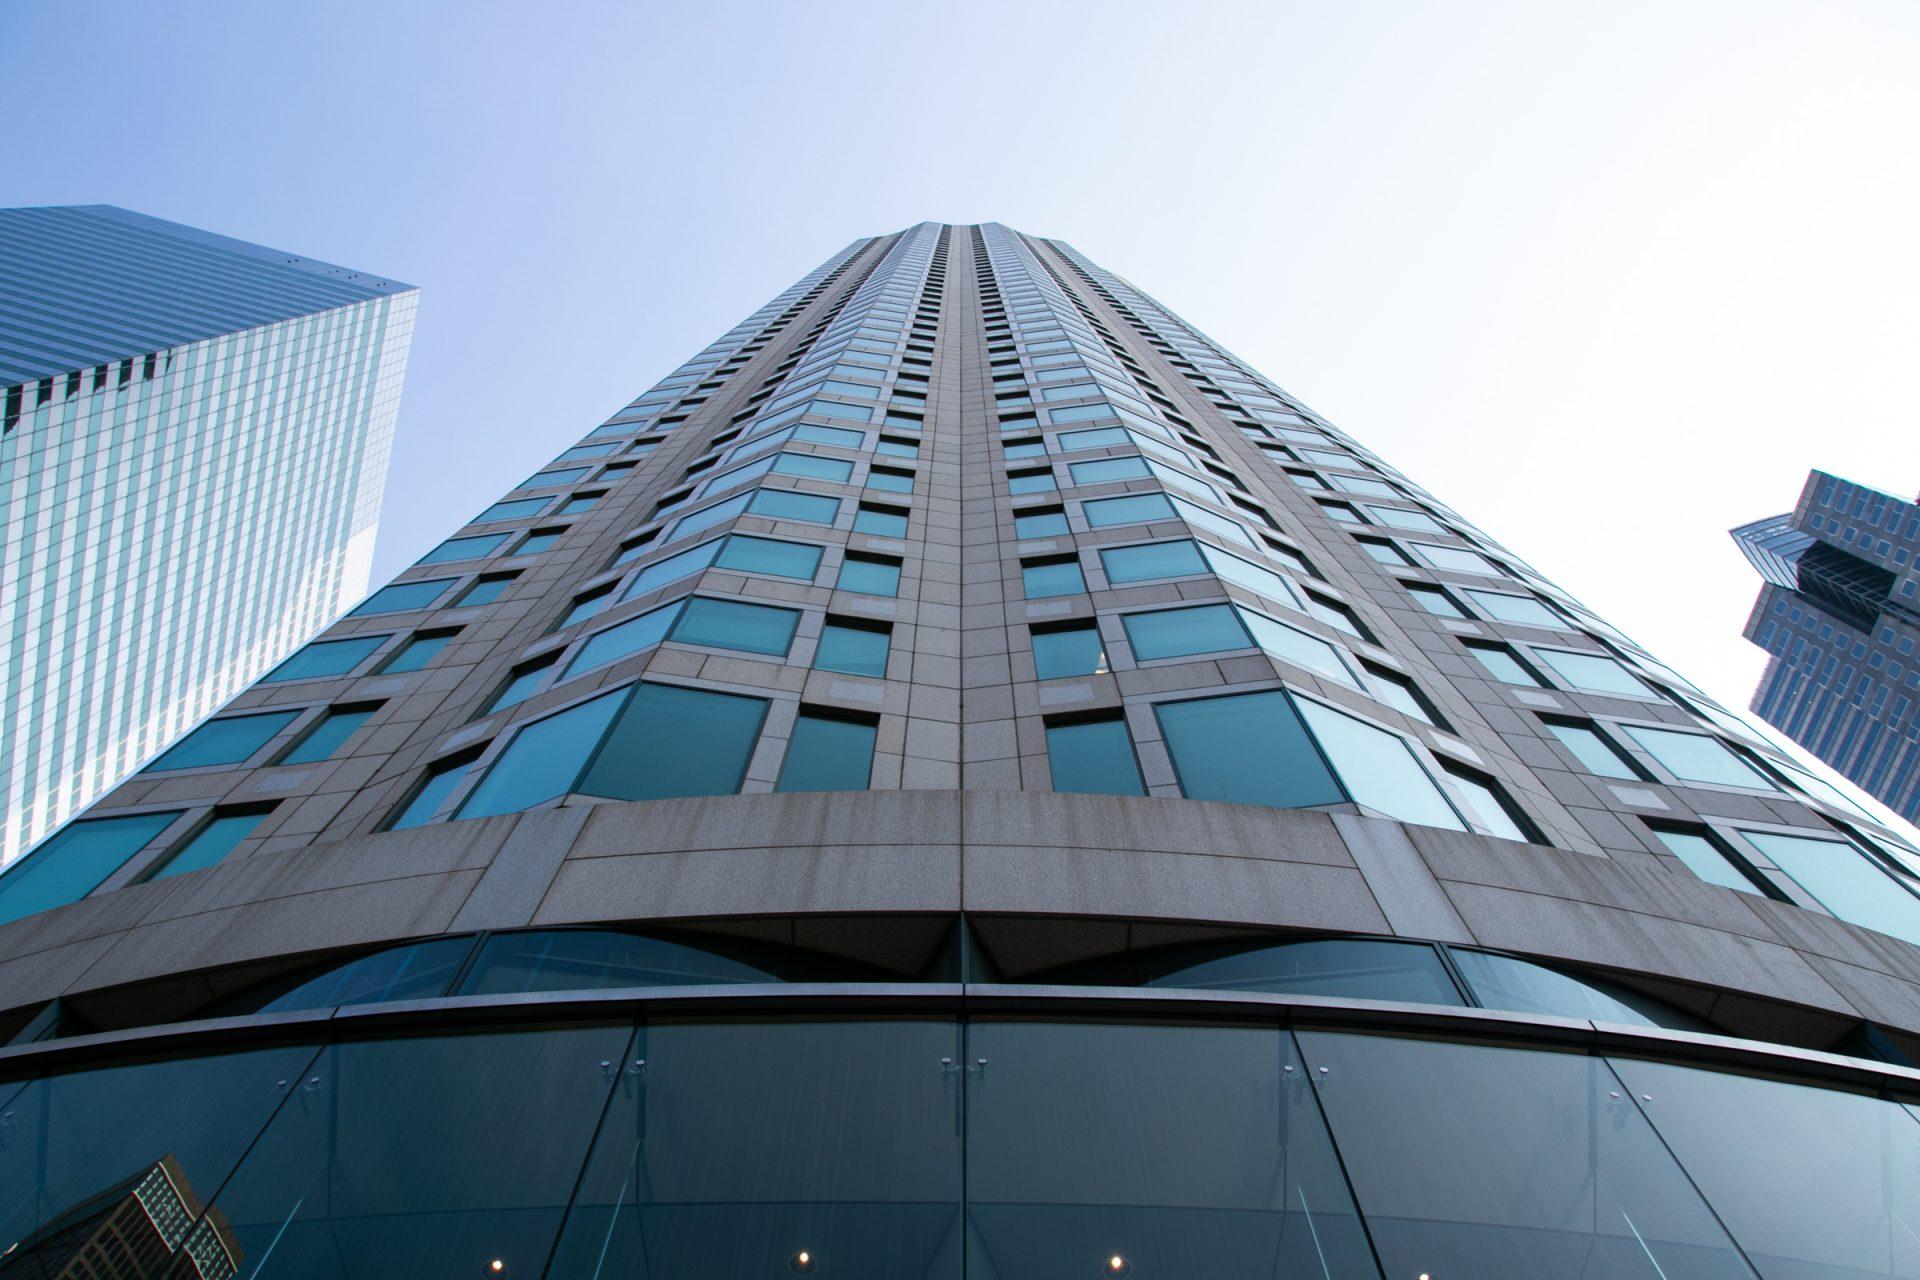 Facade Of Tall Building Against Sky